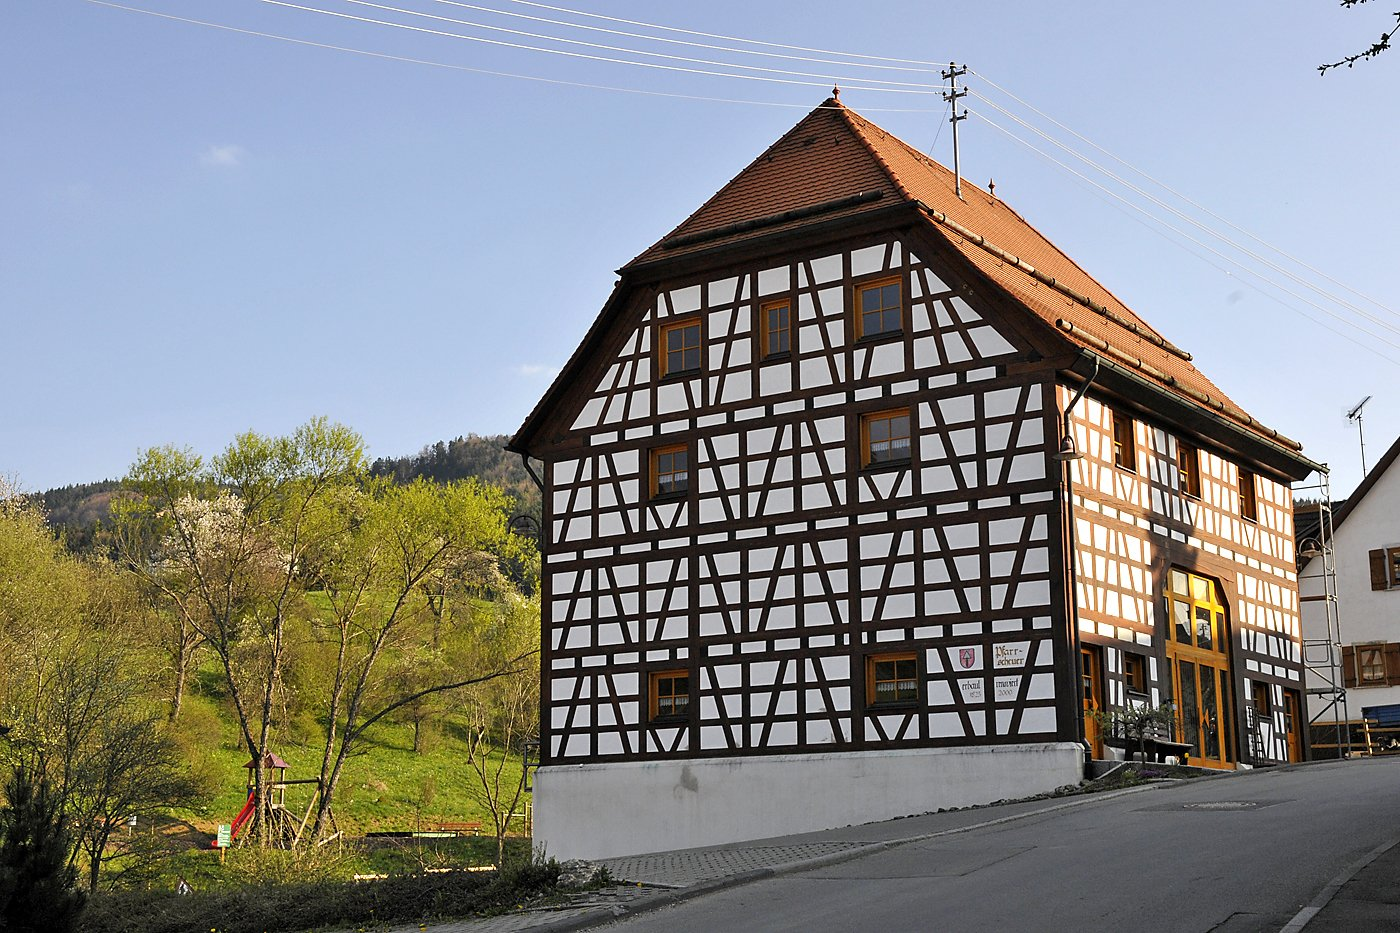 Ehemalige Pfarrscheuer in Ratshausen